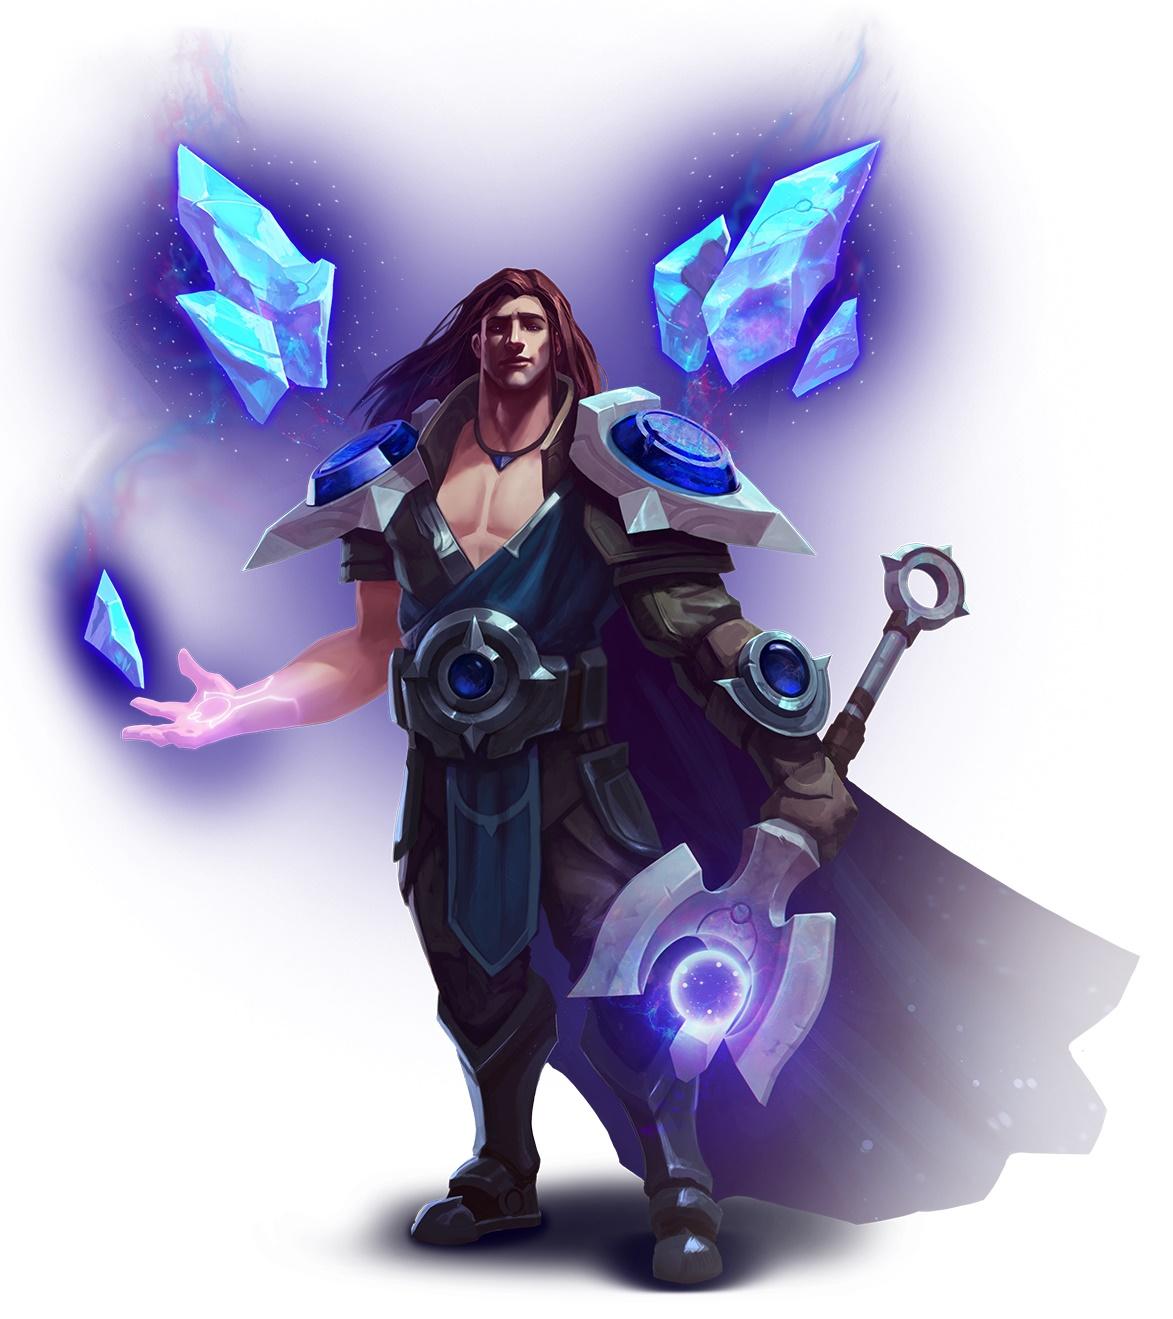 Ezreal Hd Wallpaper Surrender At 20 Champion Update Taric The Shield Of Valoran